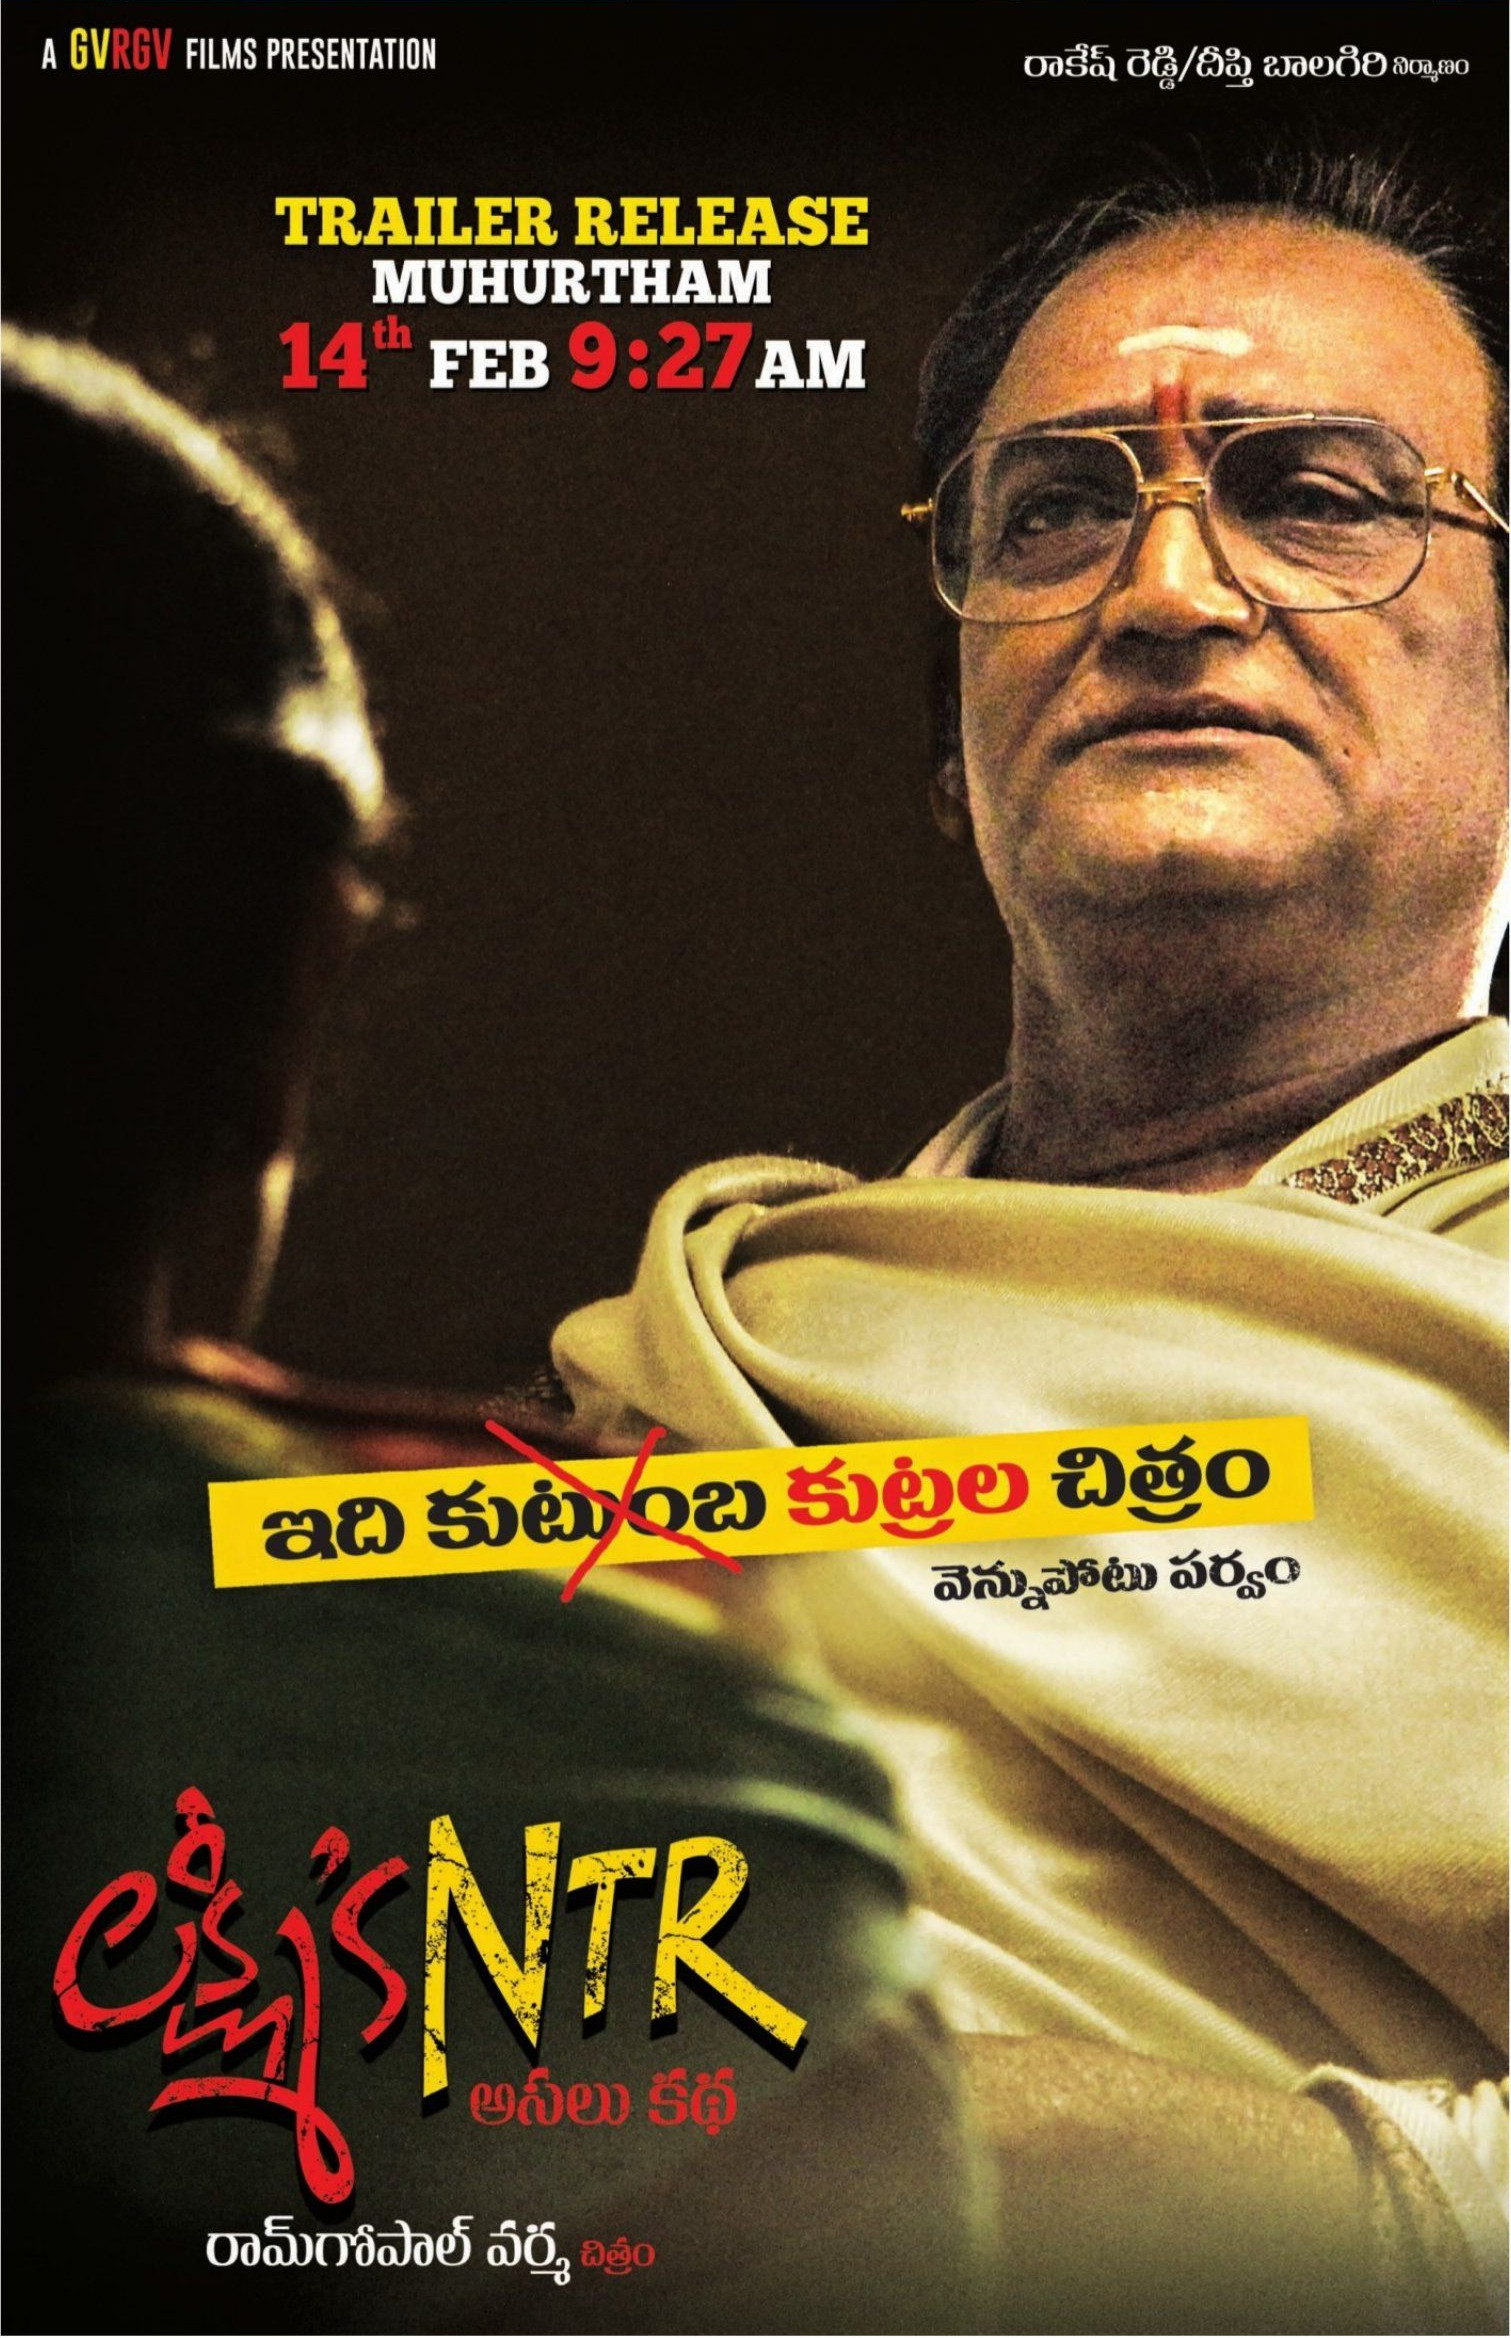 Rajsekhar Aningi in Lakshmi's NTR Movie Trailer Release Today Posters